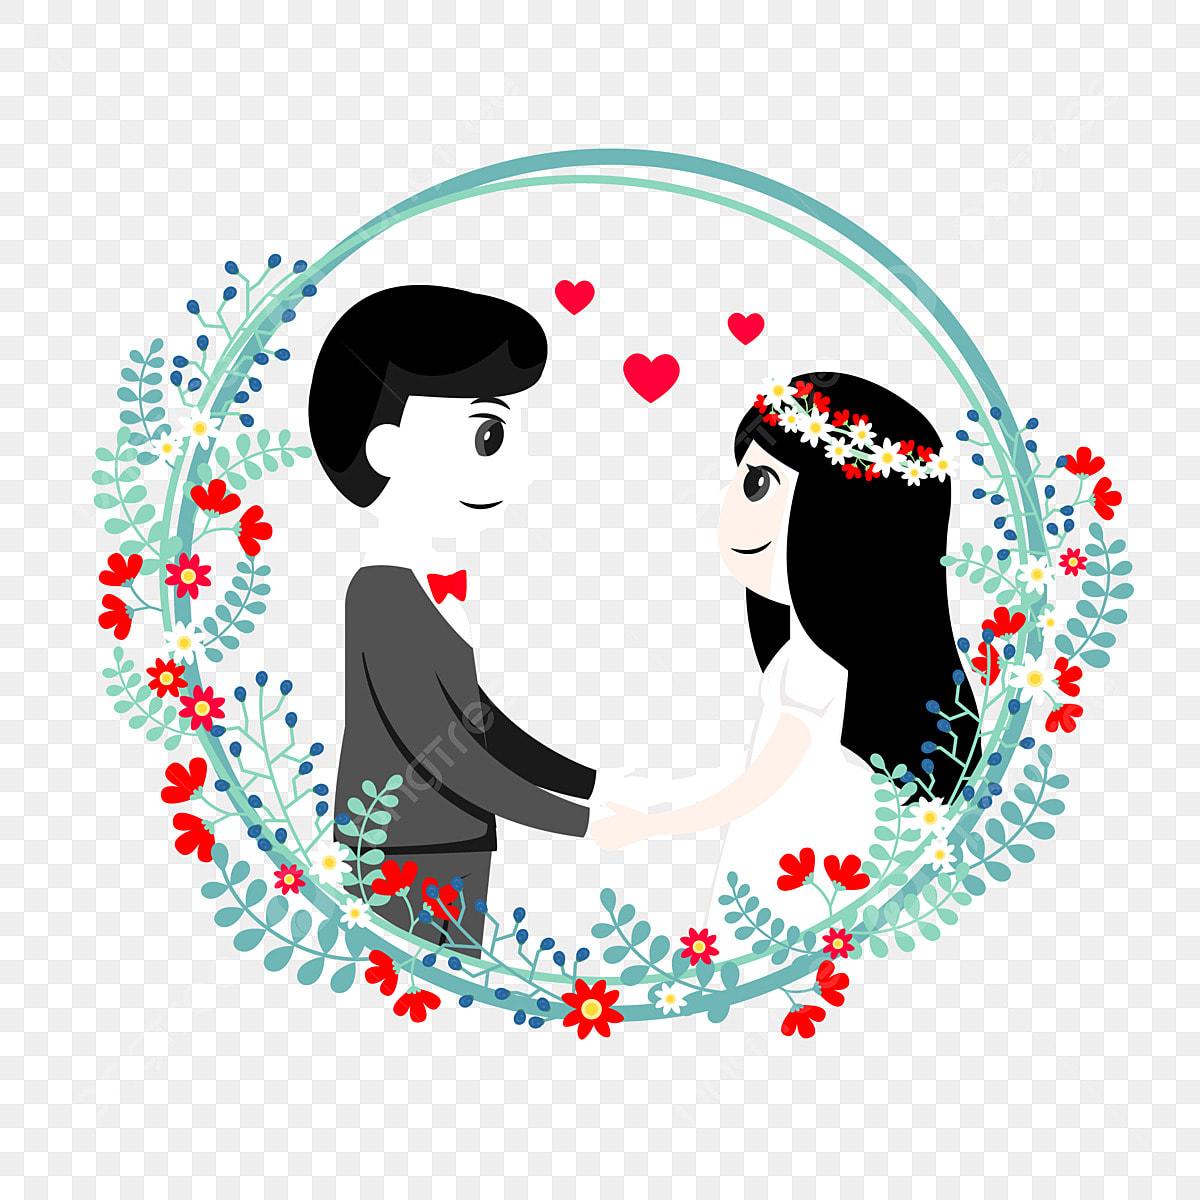 pengantin perempuan pengantin lelaki pengantin kartun